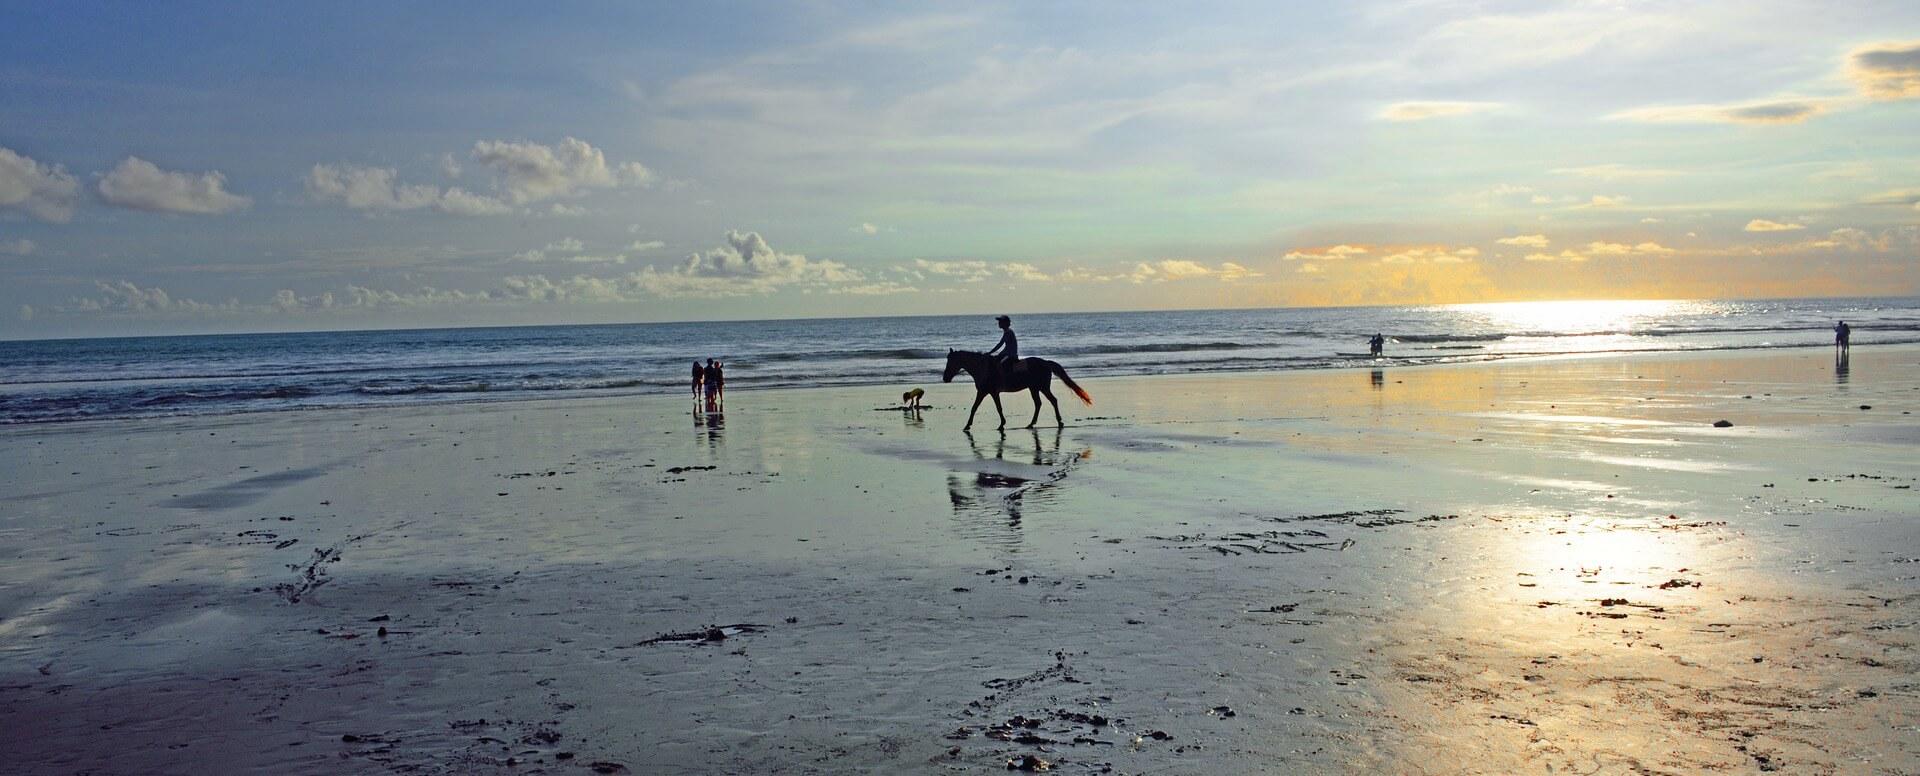 6- Uluwatu et la péninsule de Bukit - Bali